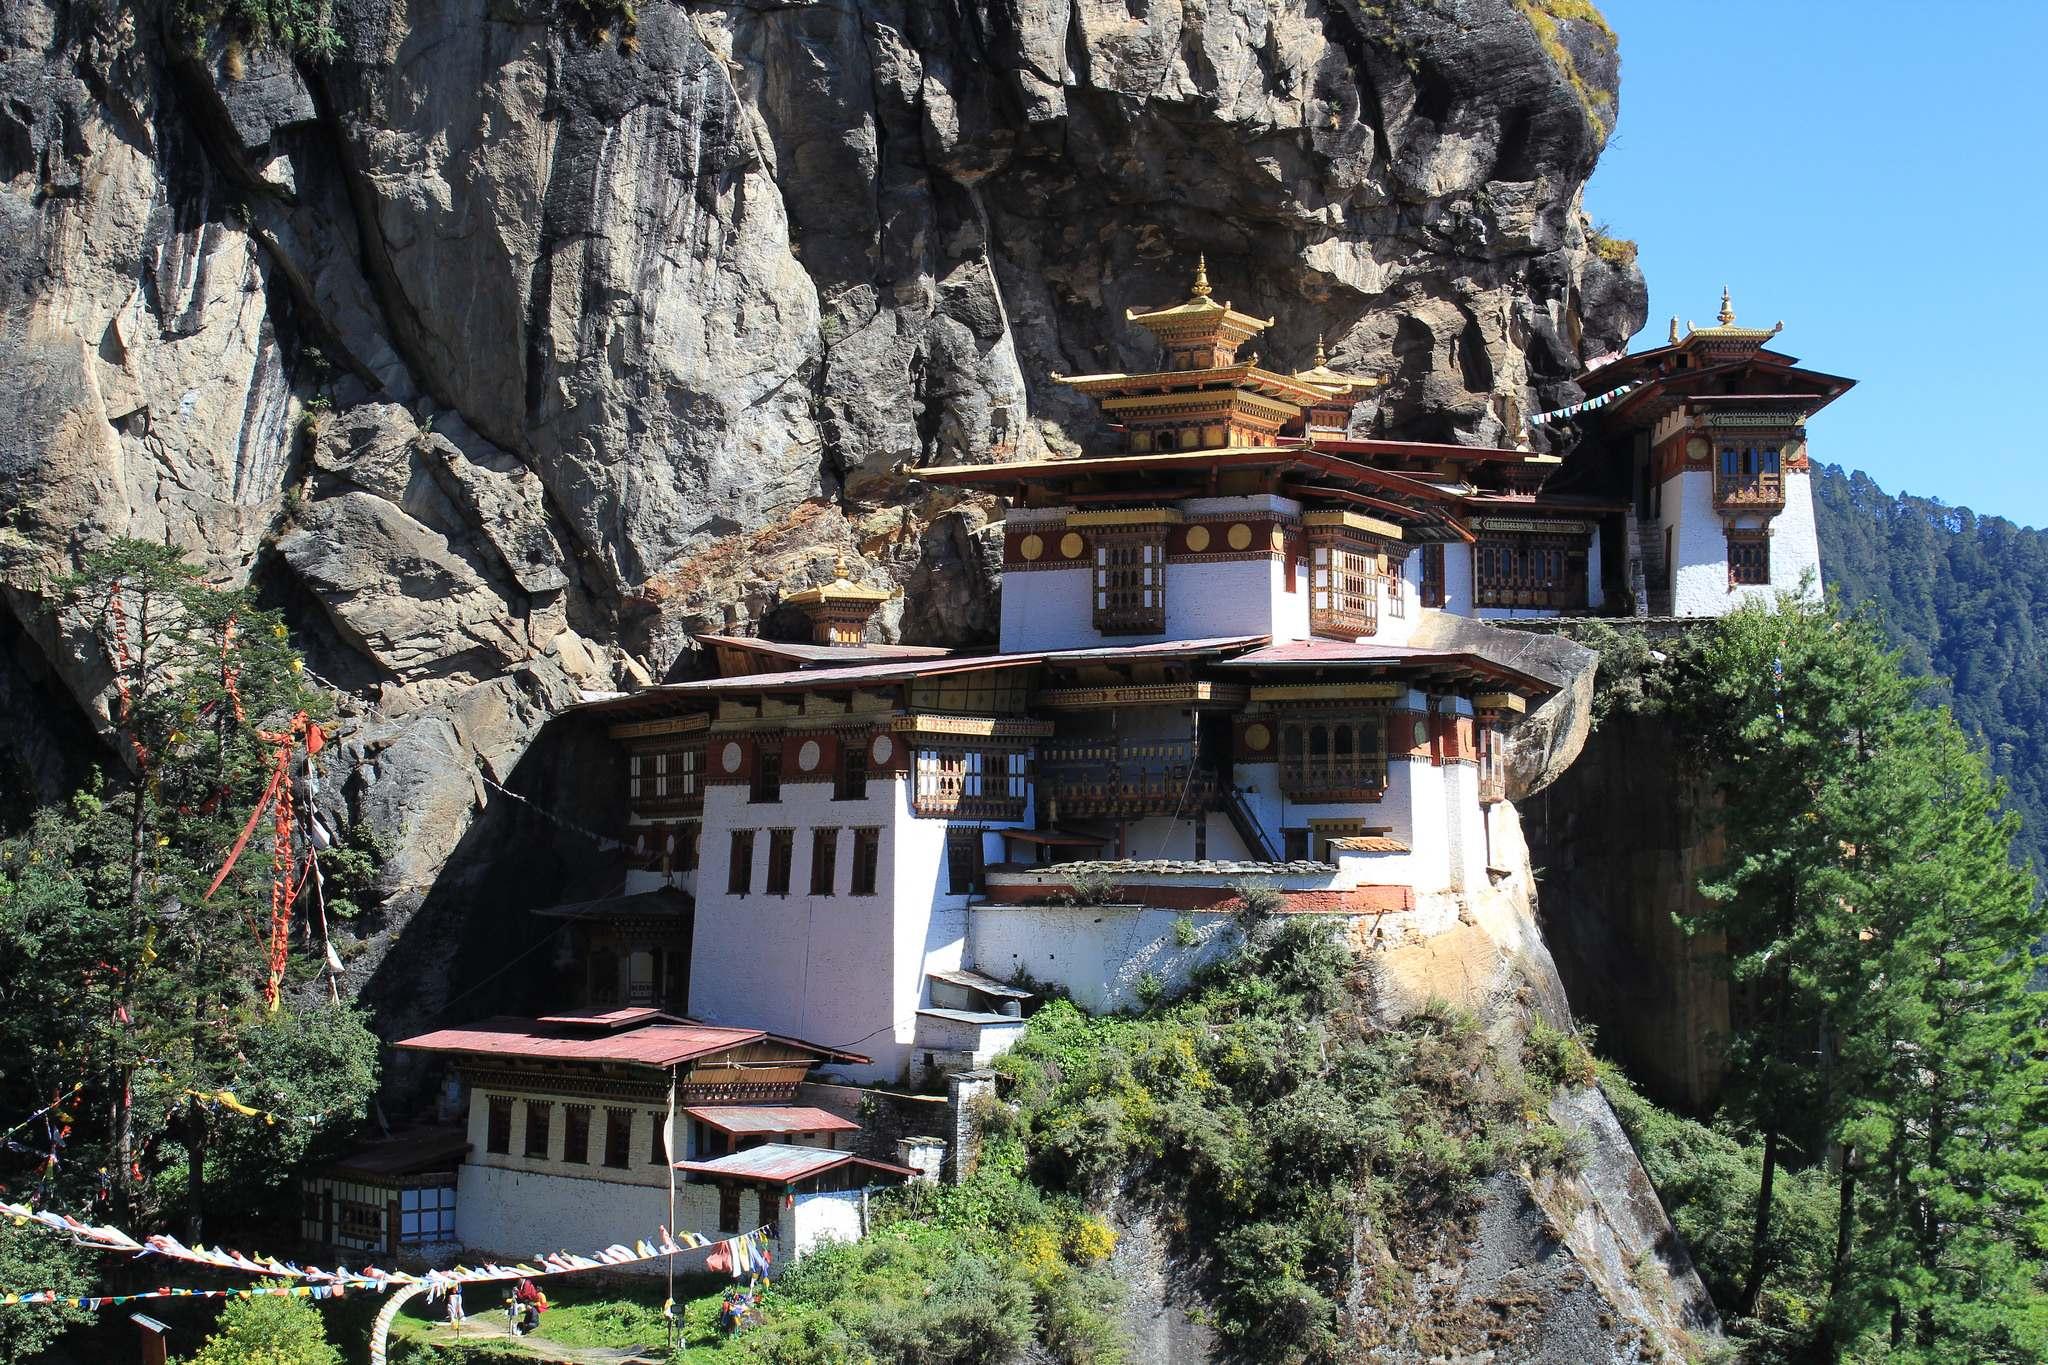 bhutan1 Bhutan   The Land of the Thunder Dragon